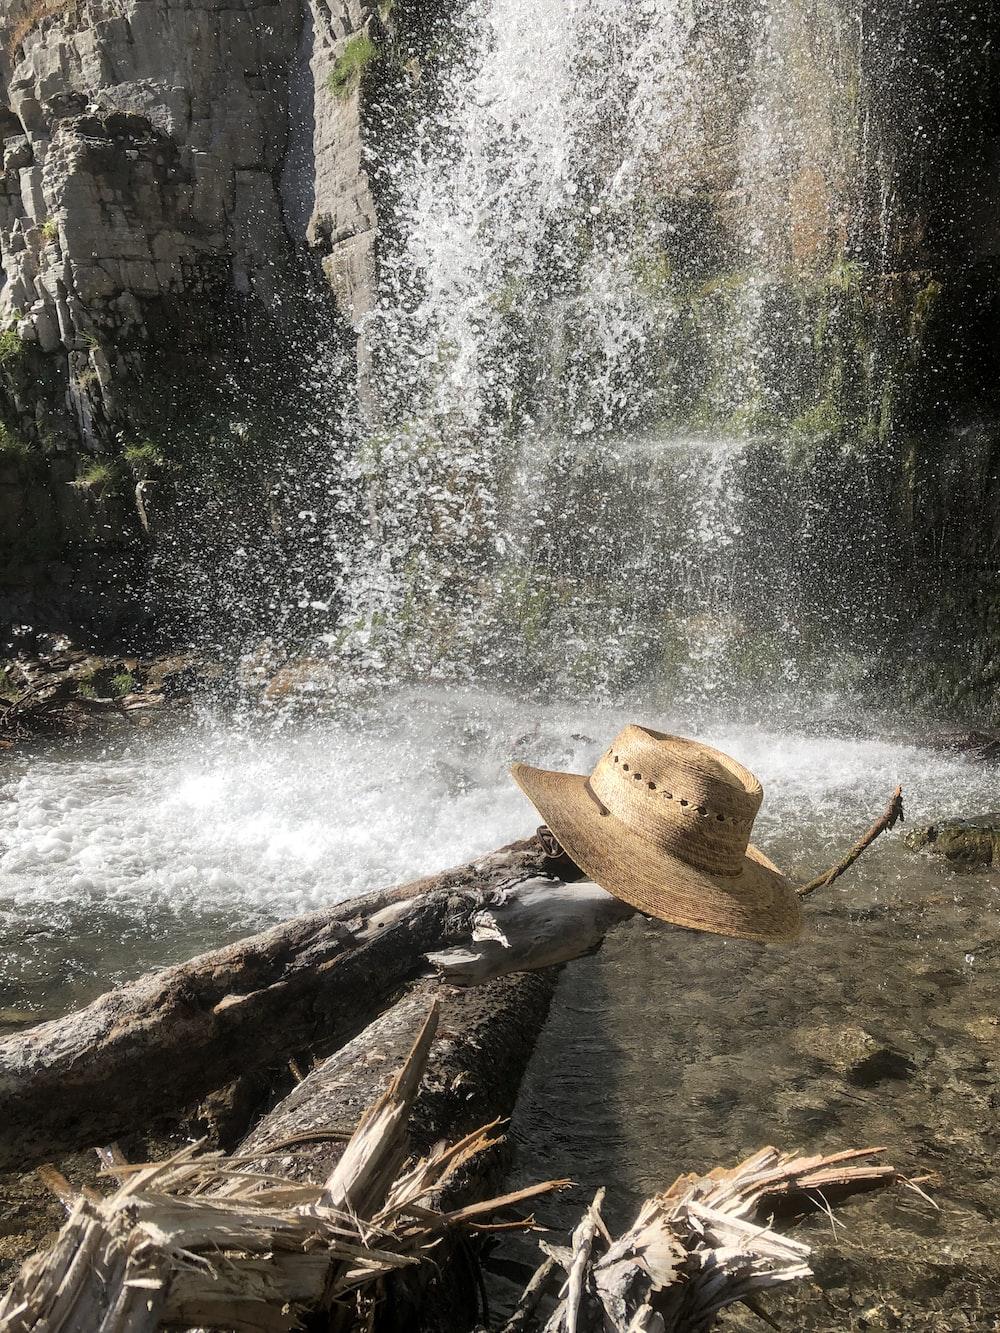 brown sun hat on edge of log near waterfalls